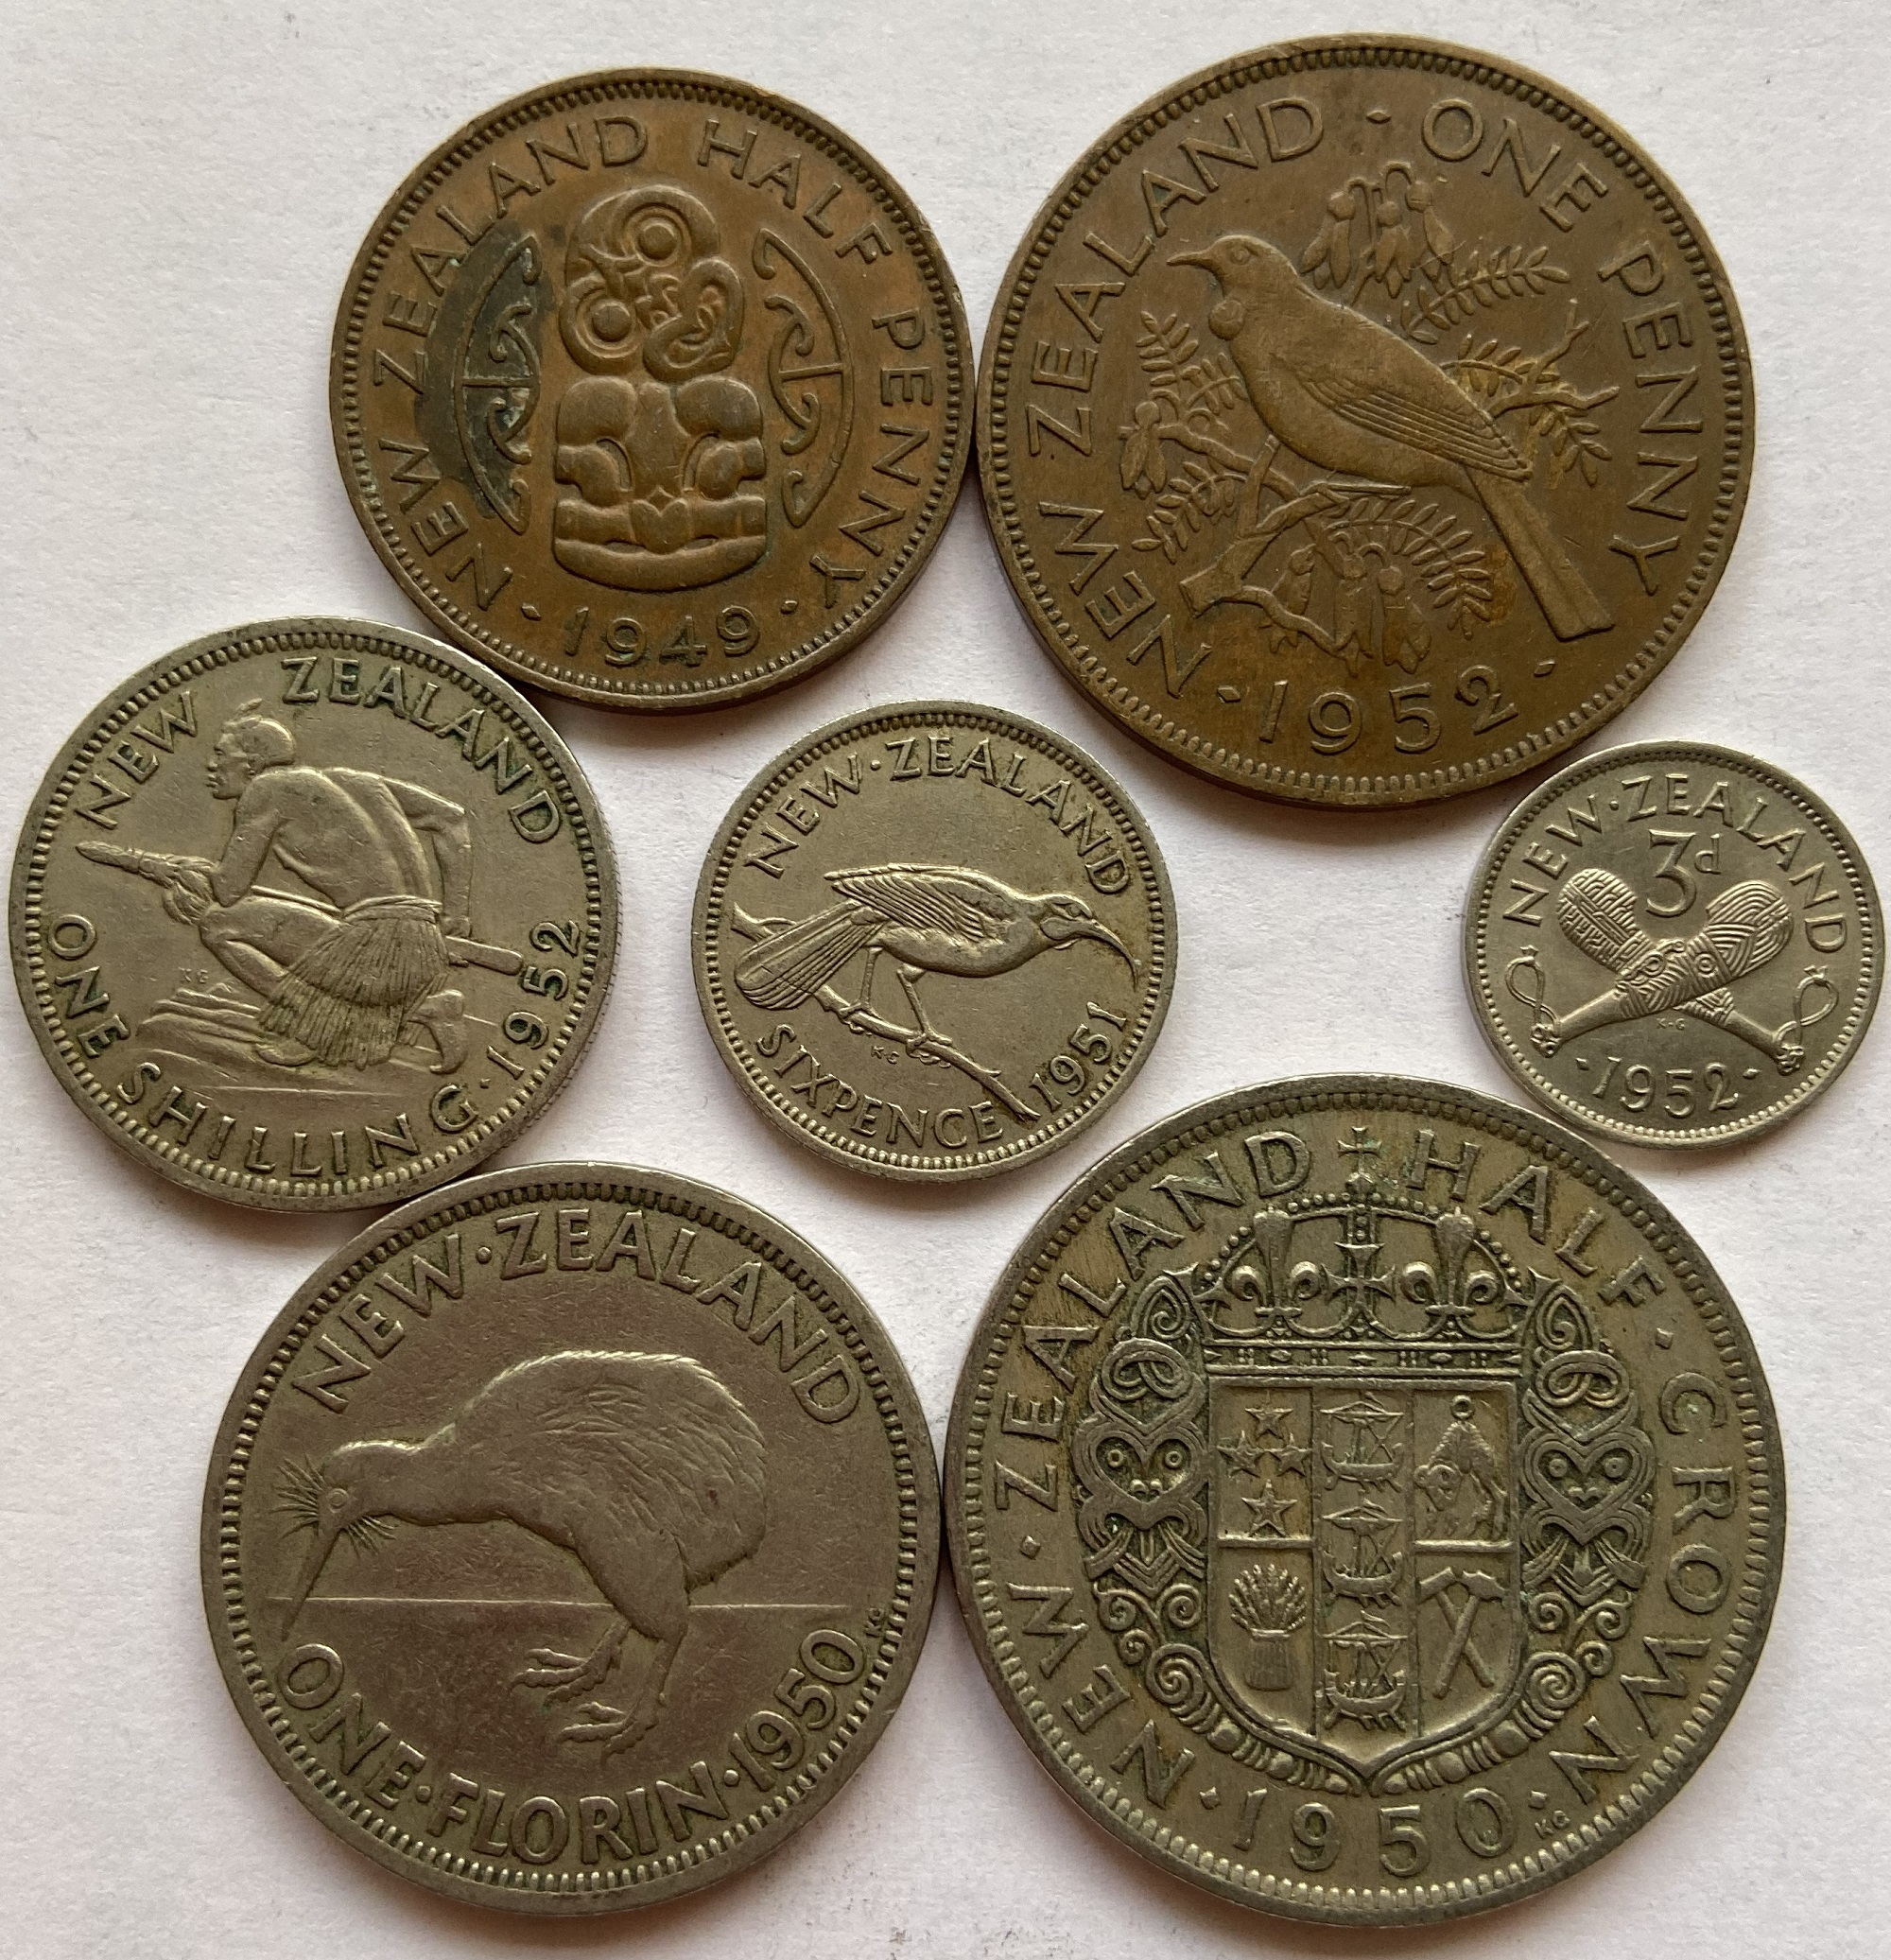 Zealand Island Coins King George